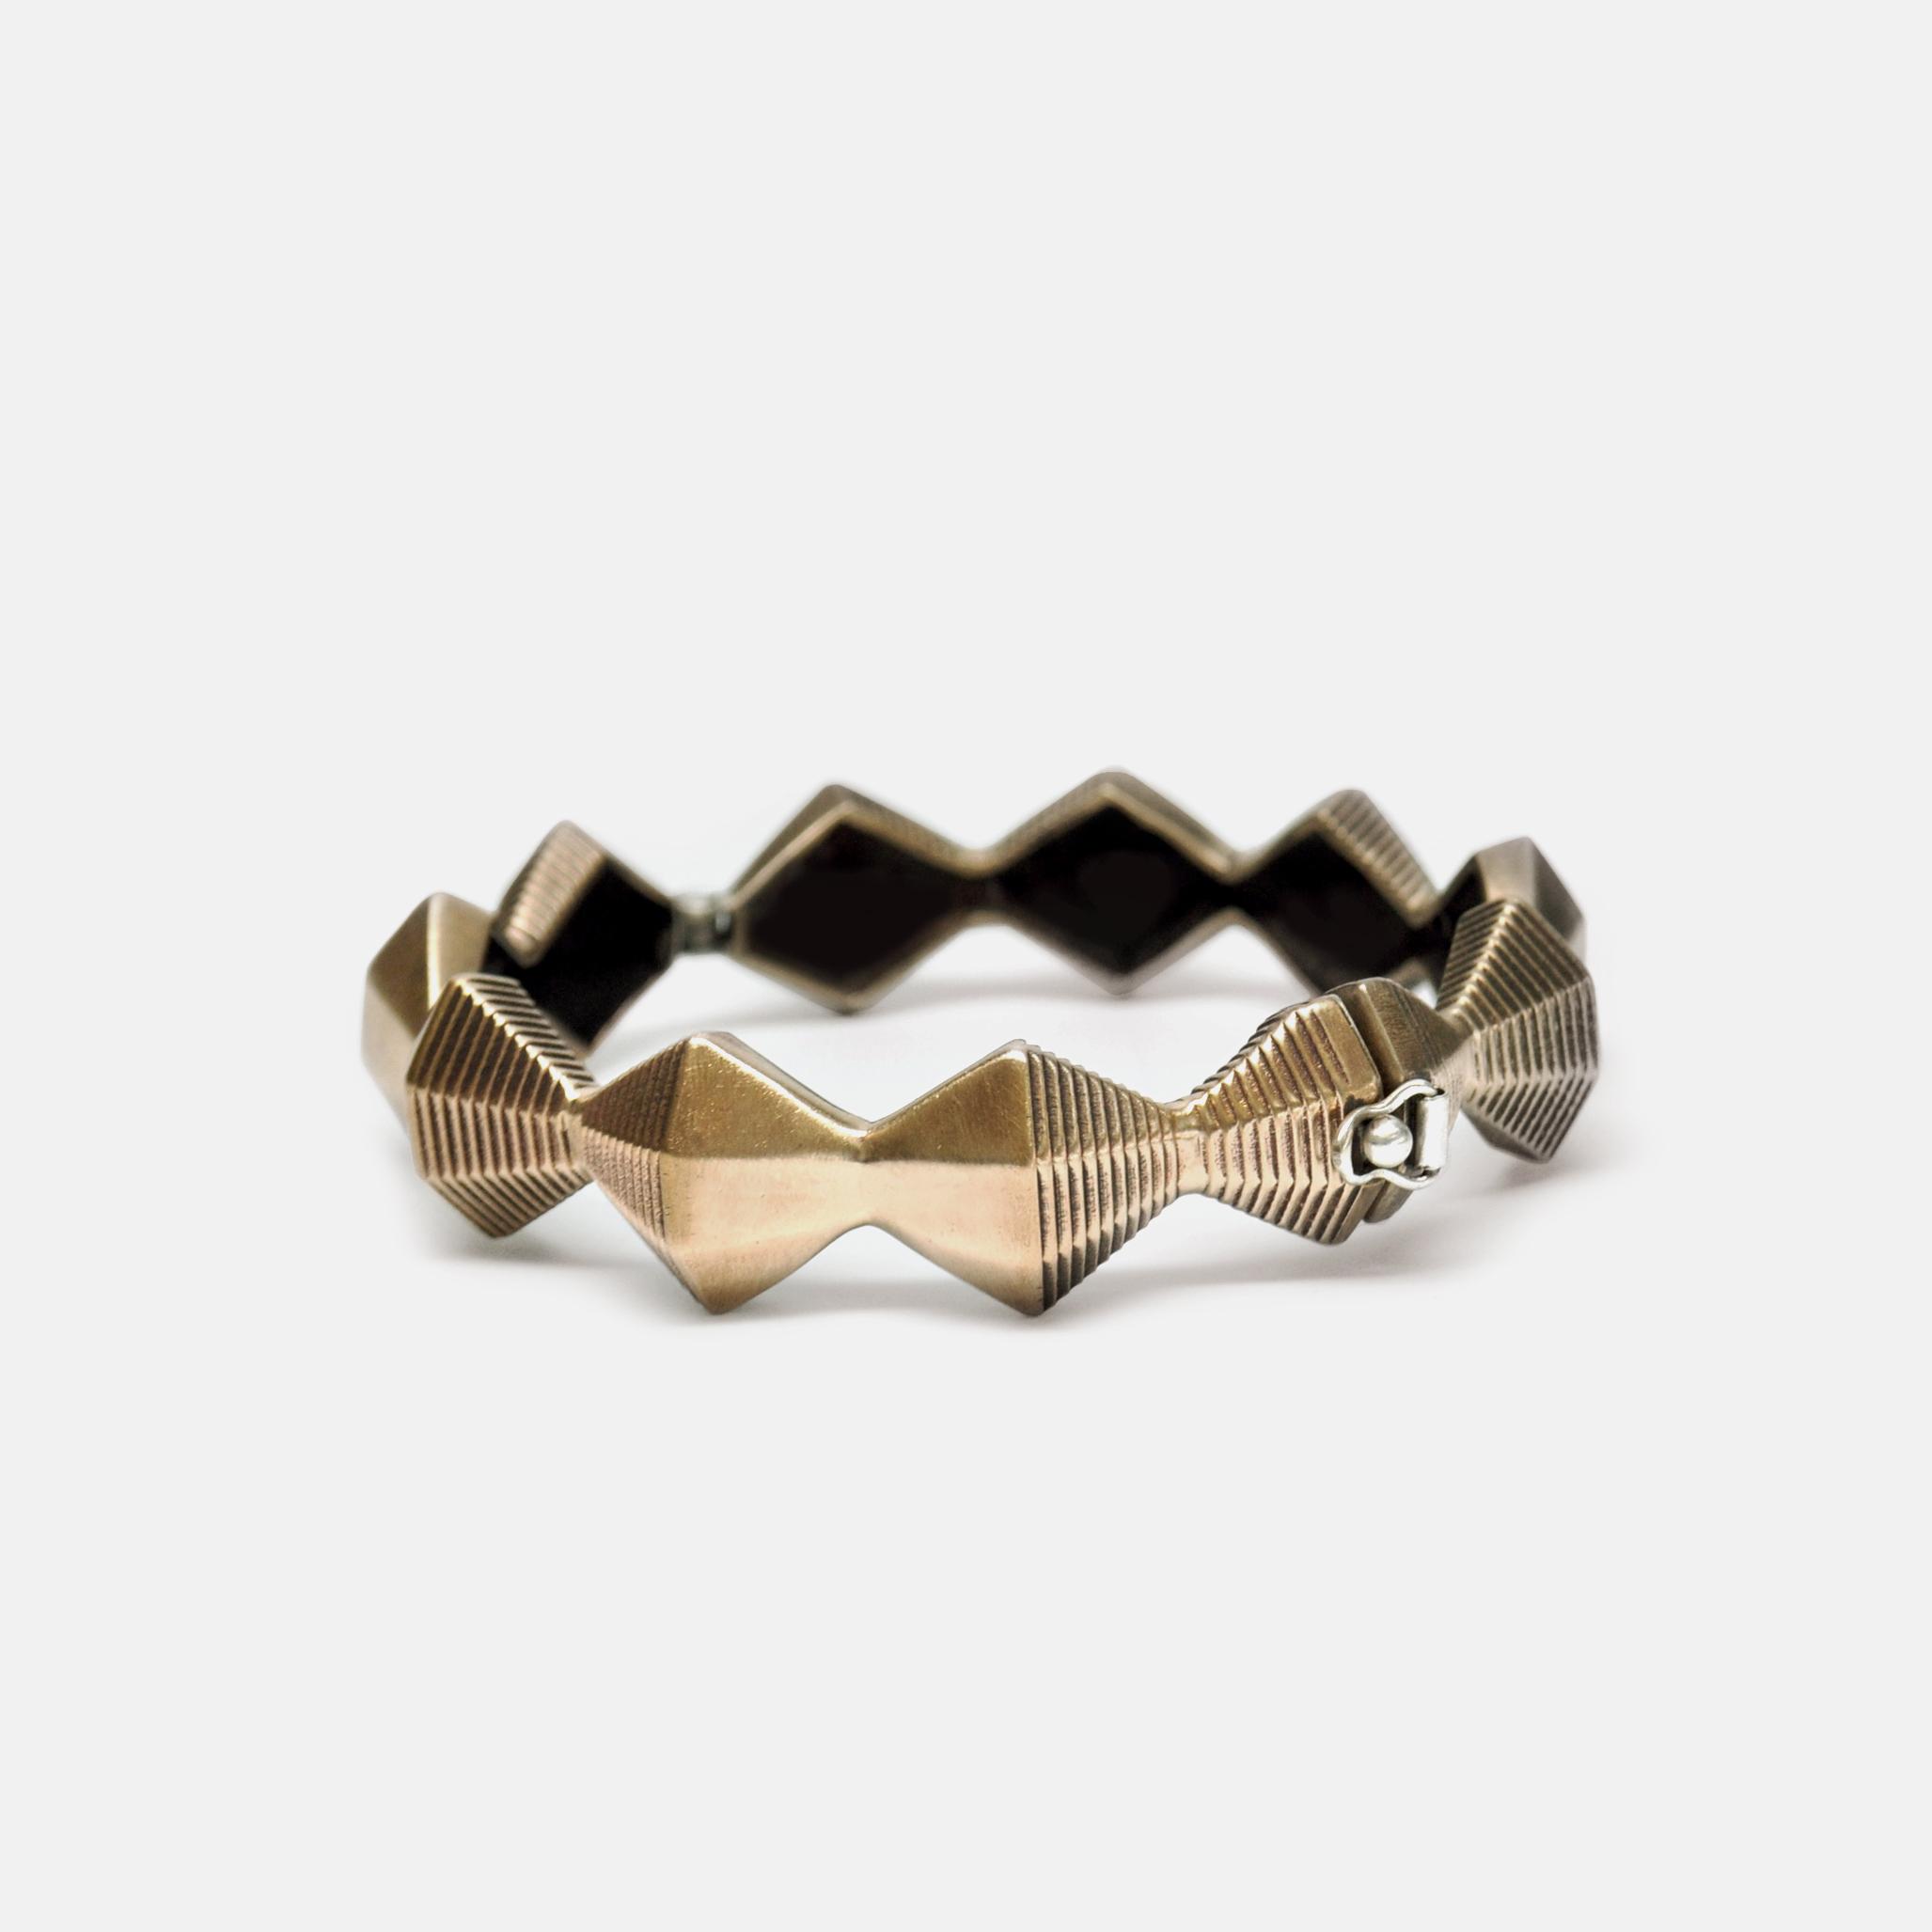 Off_White_Marisa_Lomonaco_Minor_Endless_Column_Bracelet_0001_Bronze.jpg